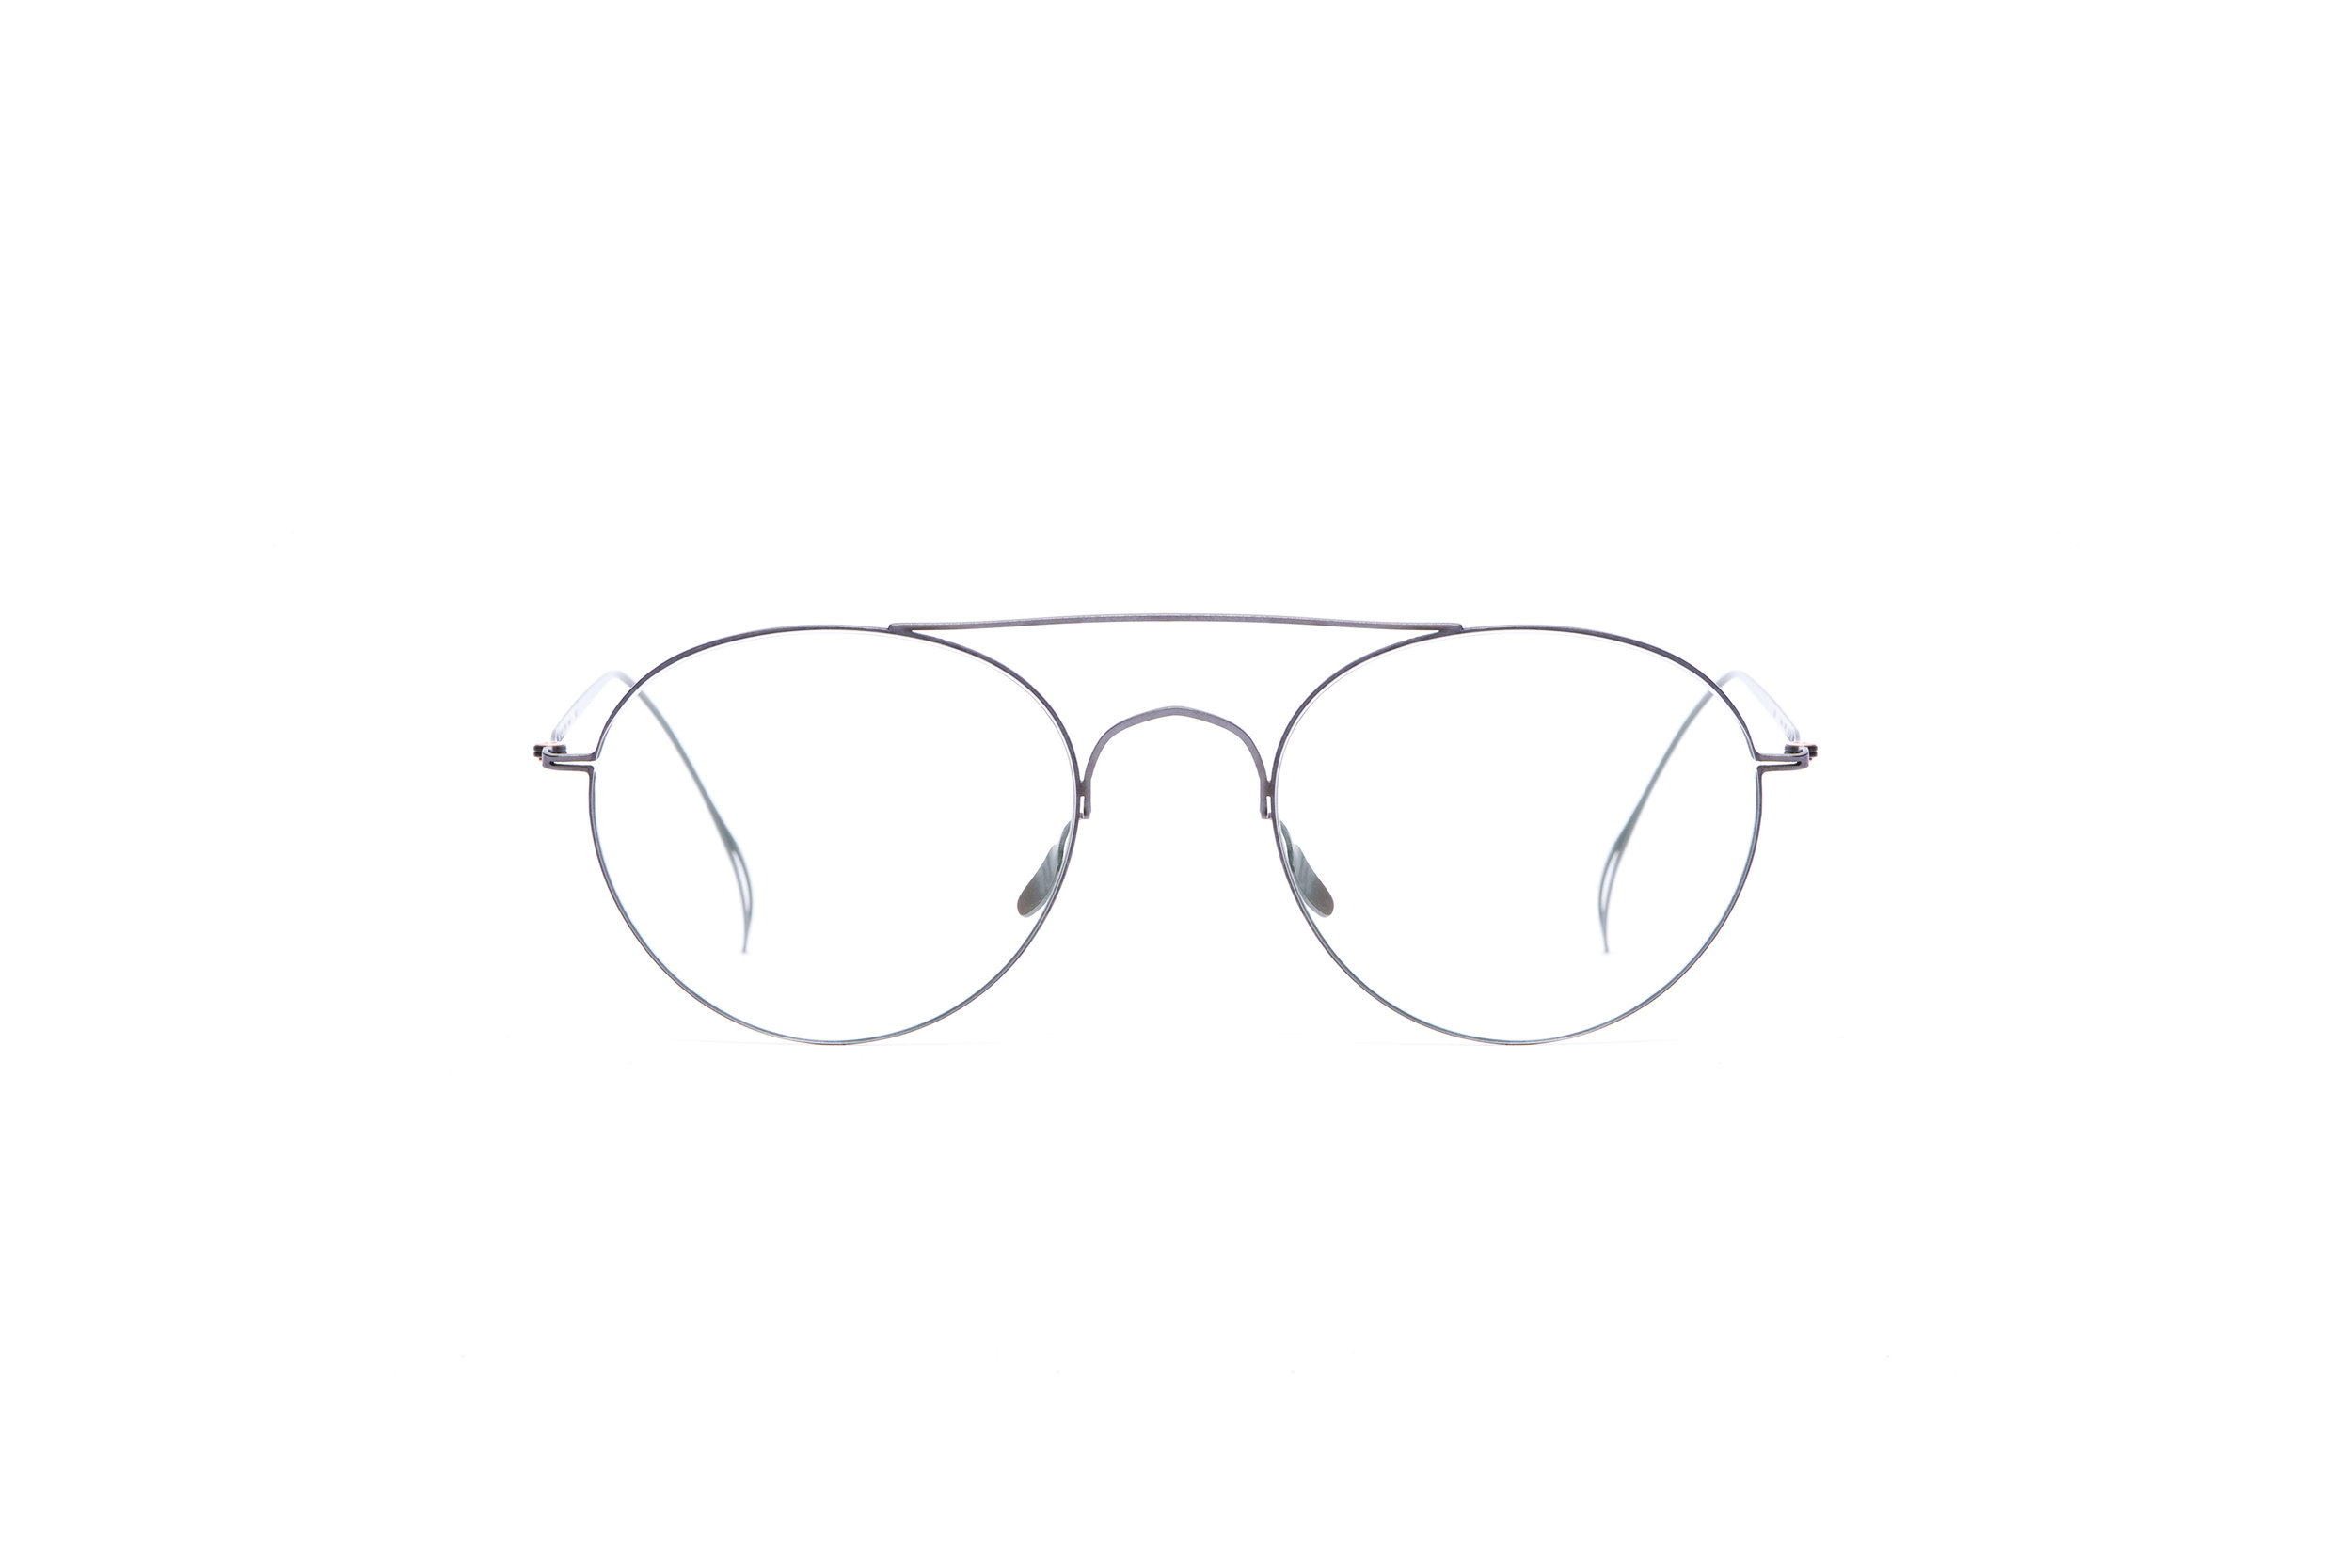 haffmans_neumeister_fawcett_gunmetal_clear_ultralight_eyeglasses_front_102461.jpg